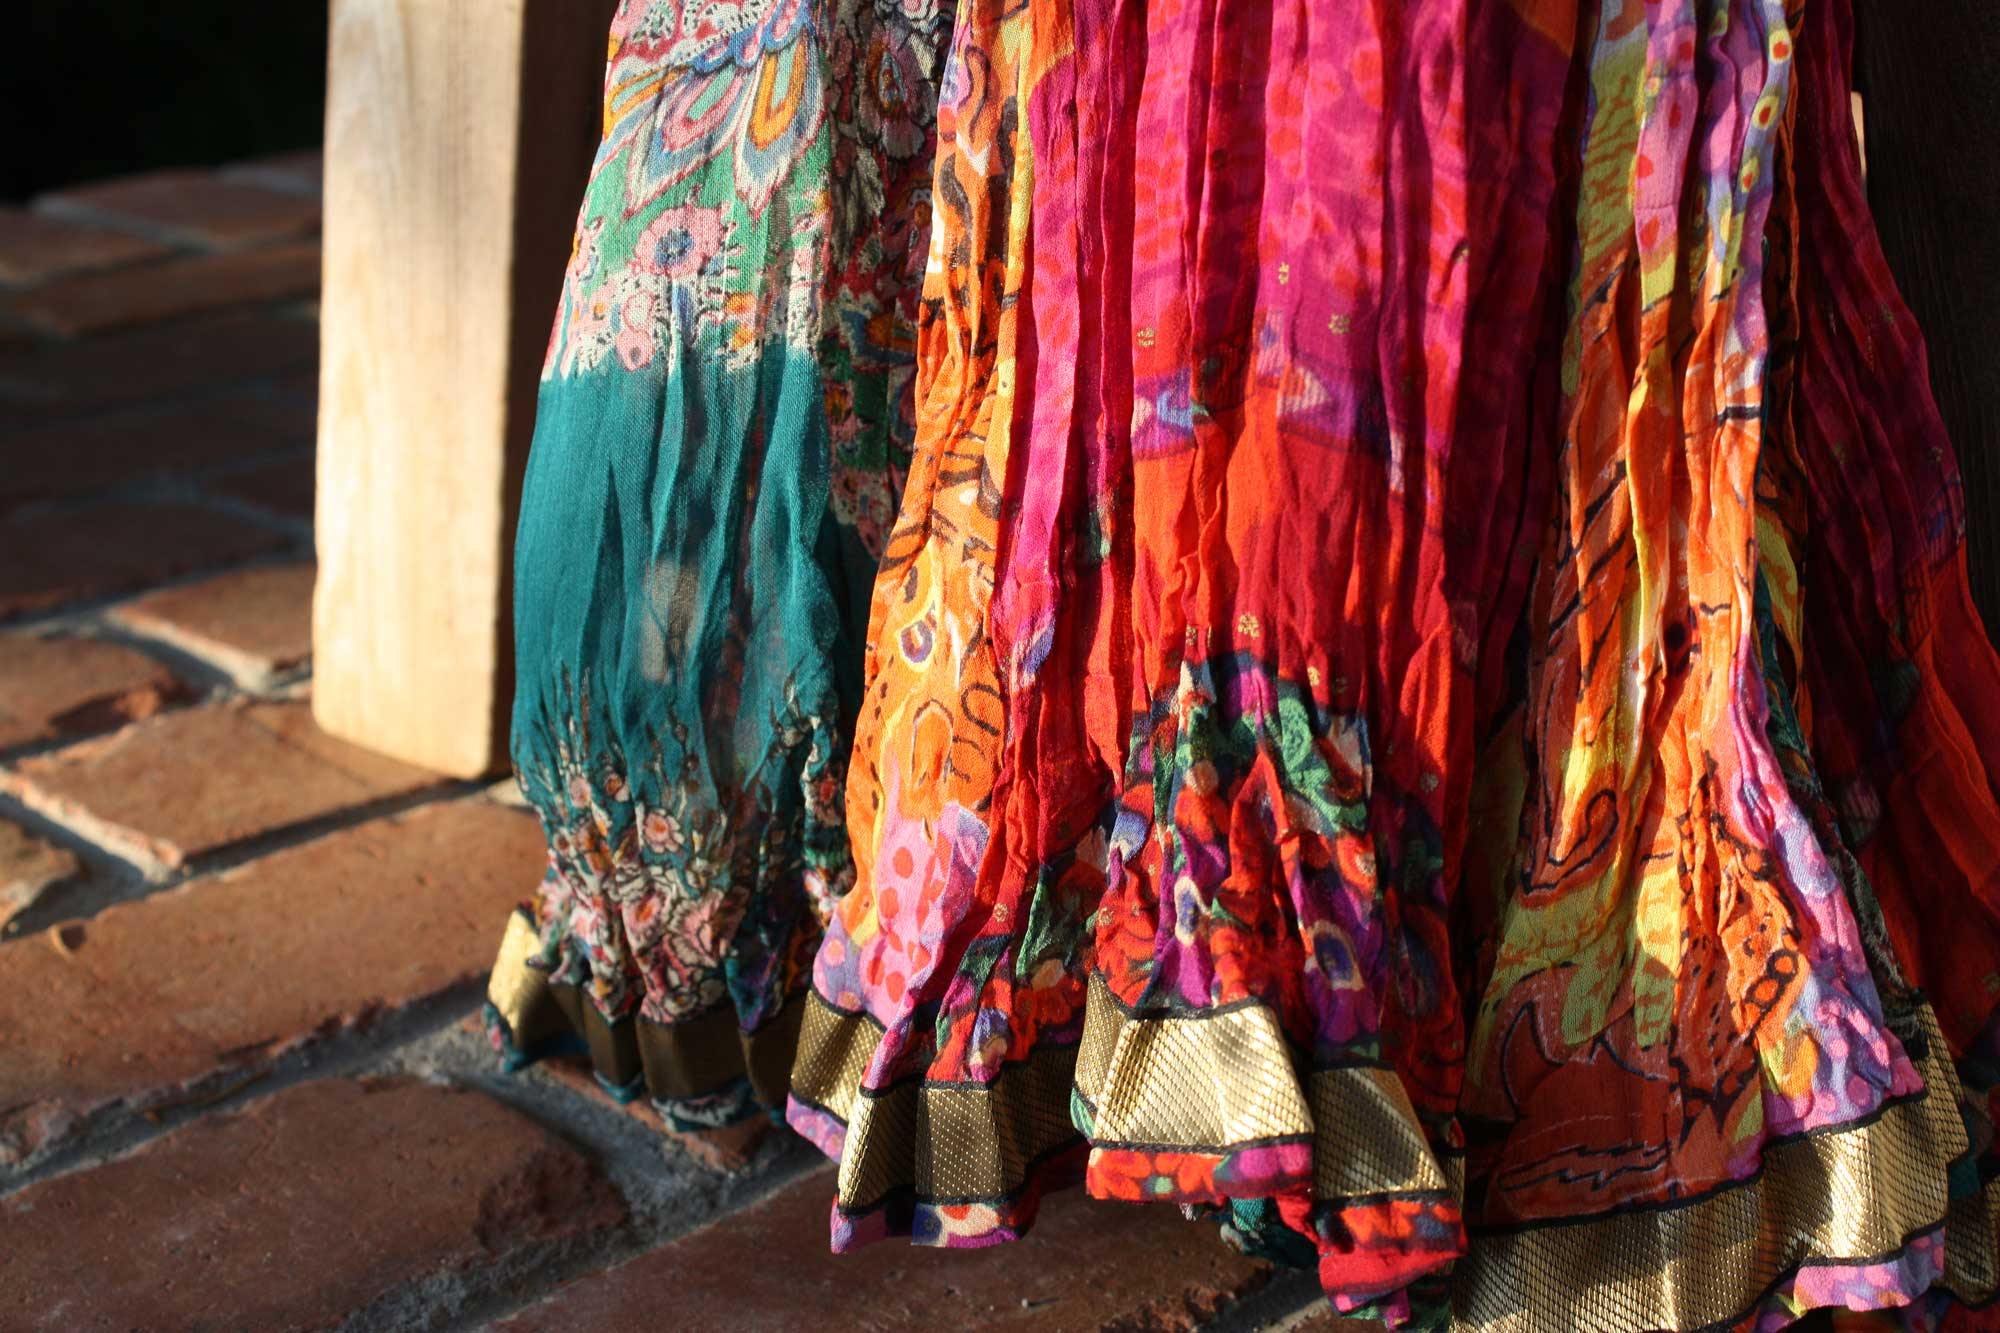 pink-teal-skirt-in-sun_web.jpg